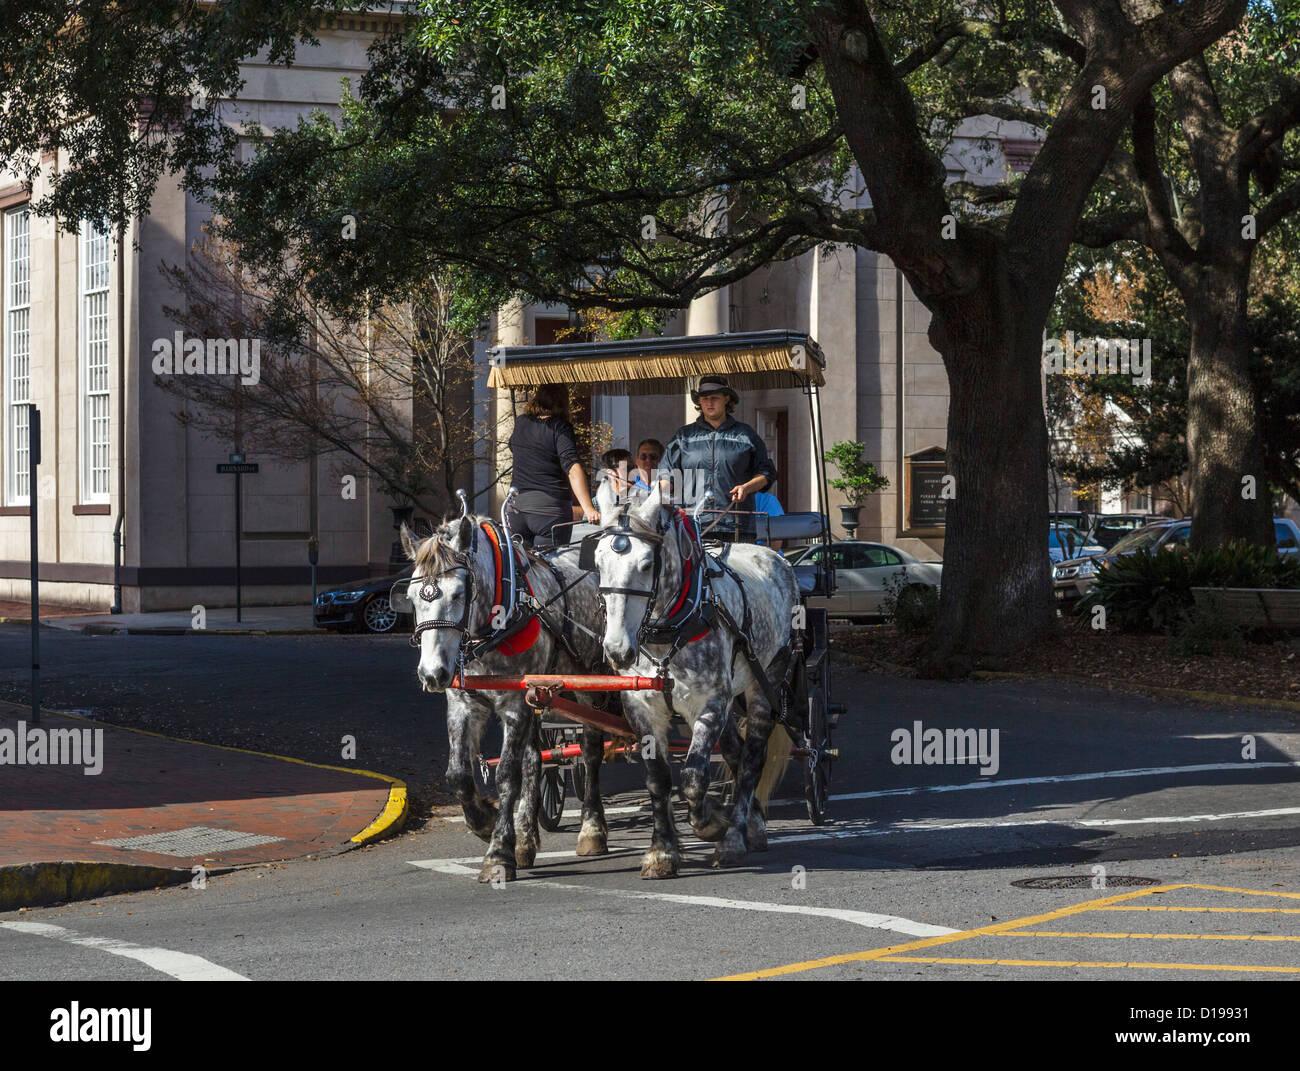 Horse drawn carriage ride in historic dowtown Savannah, Georgia, USA - Stock Image